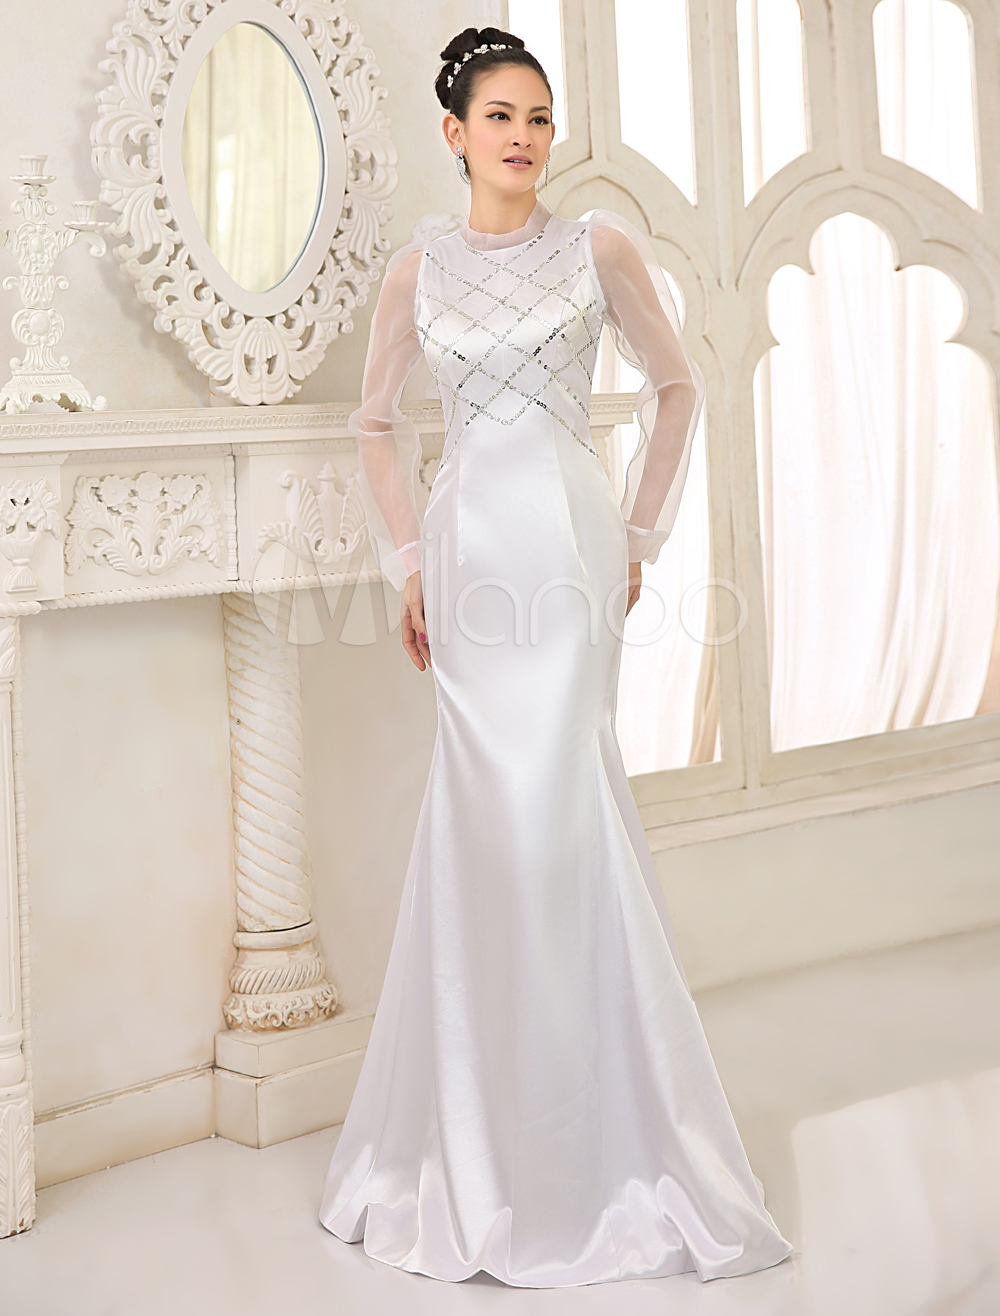 White Satin Sleeveless Ladies Evening Dress